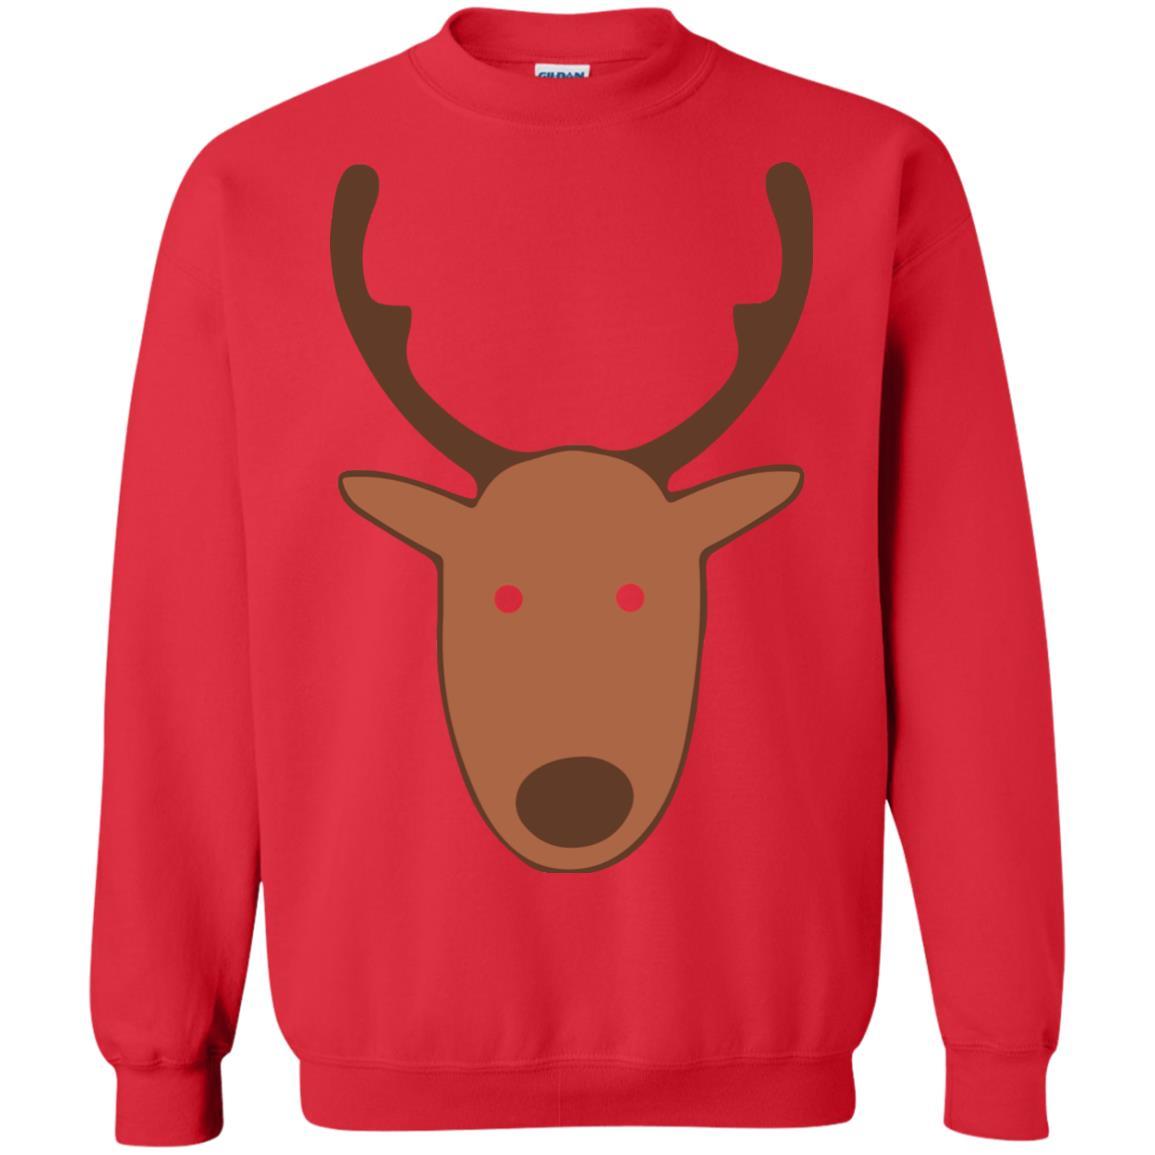 image 4775 - Tina Belcher Reindeer Christmas Sweater, Shirt, Hoodie